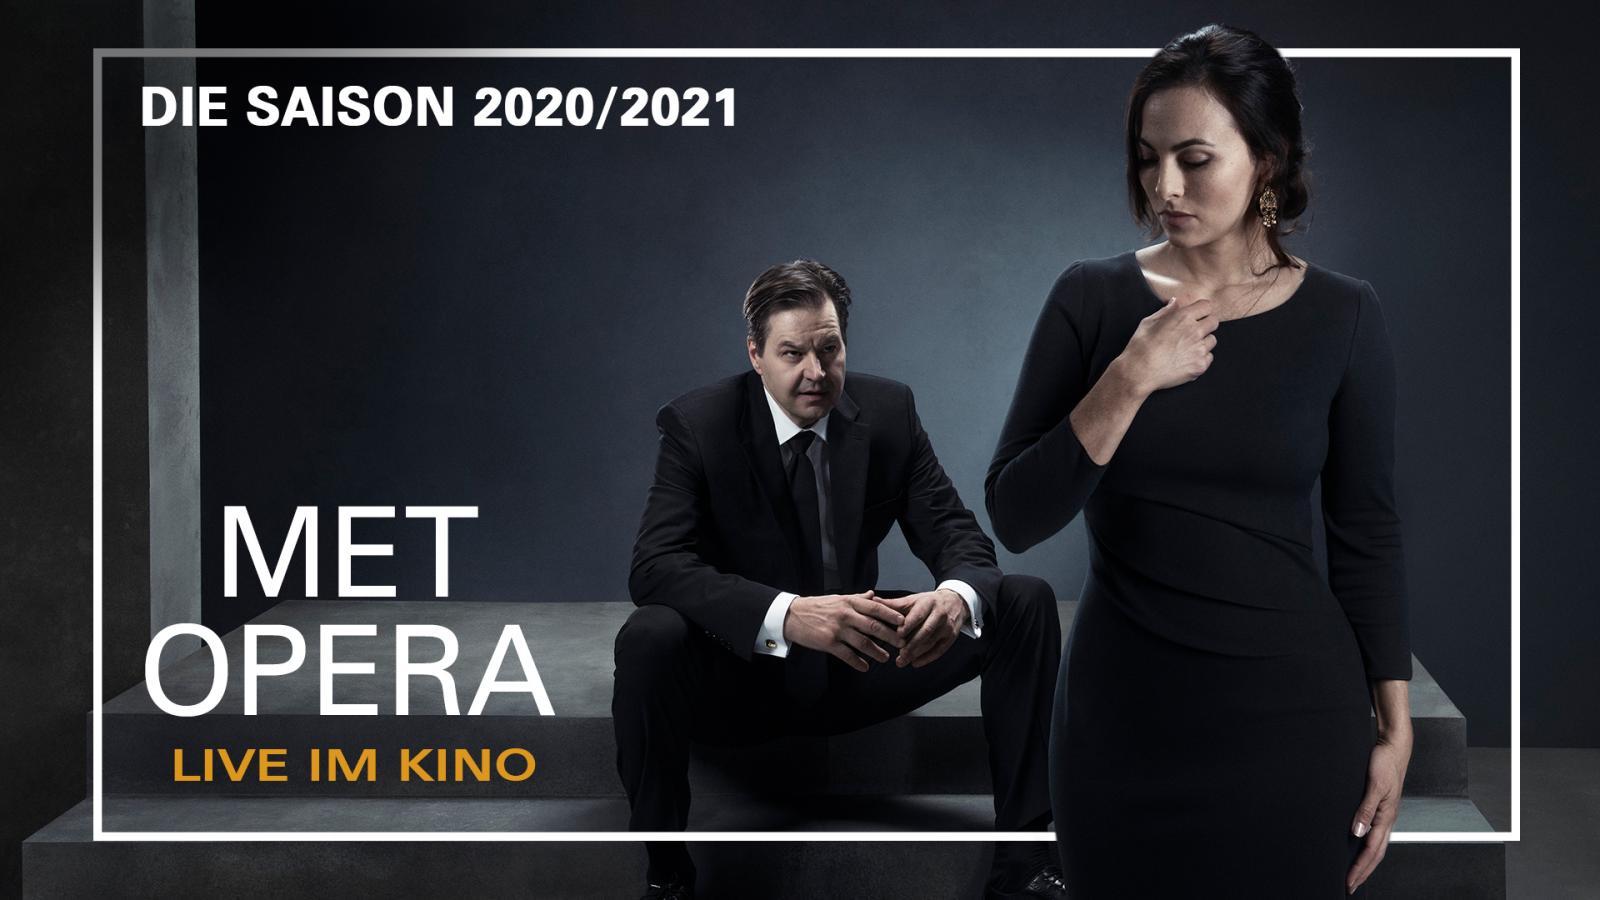 Live-Saison 2020/2021: ABGESAGT!